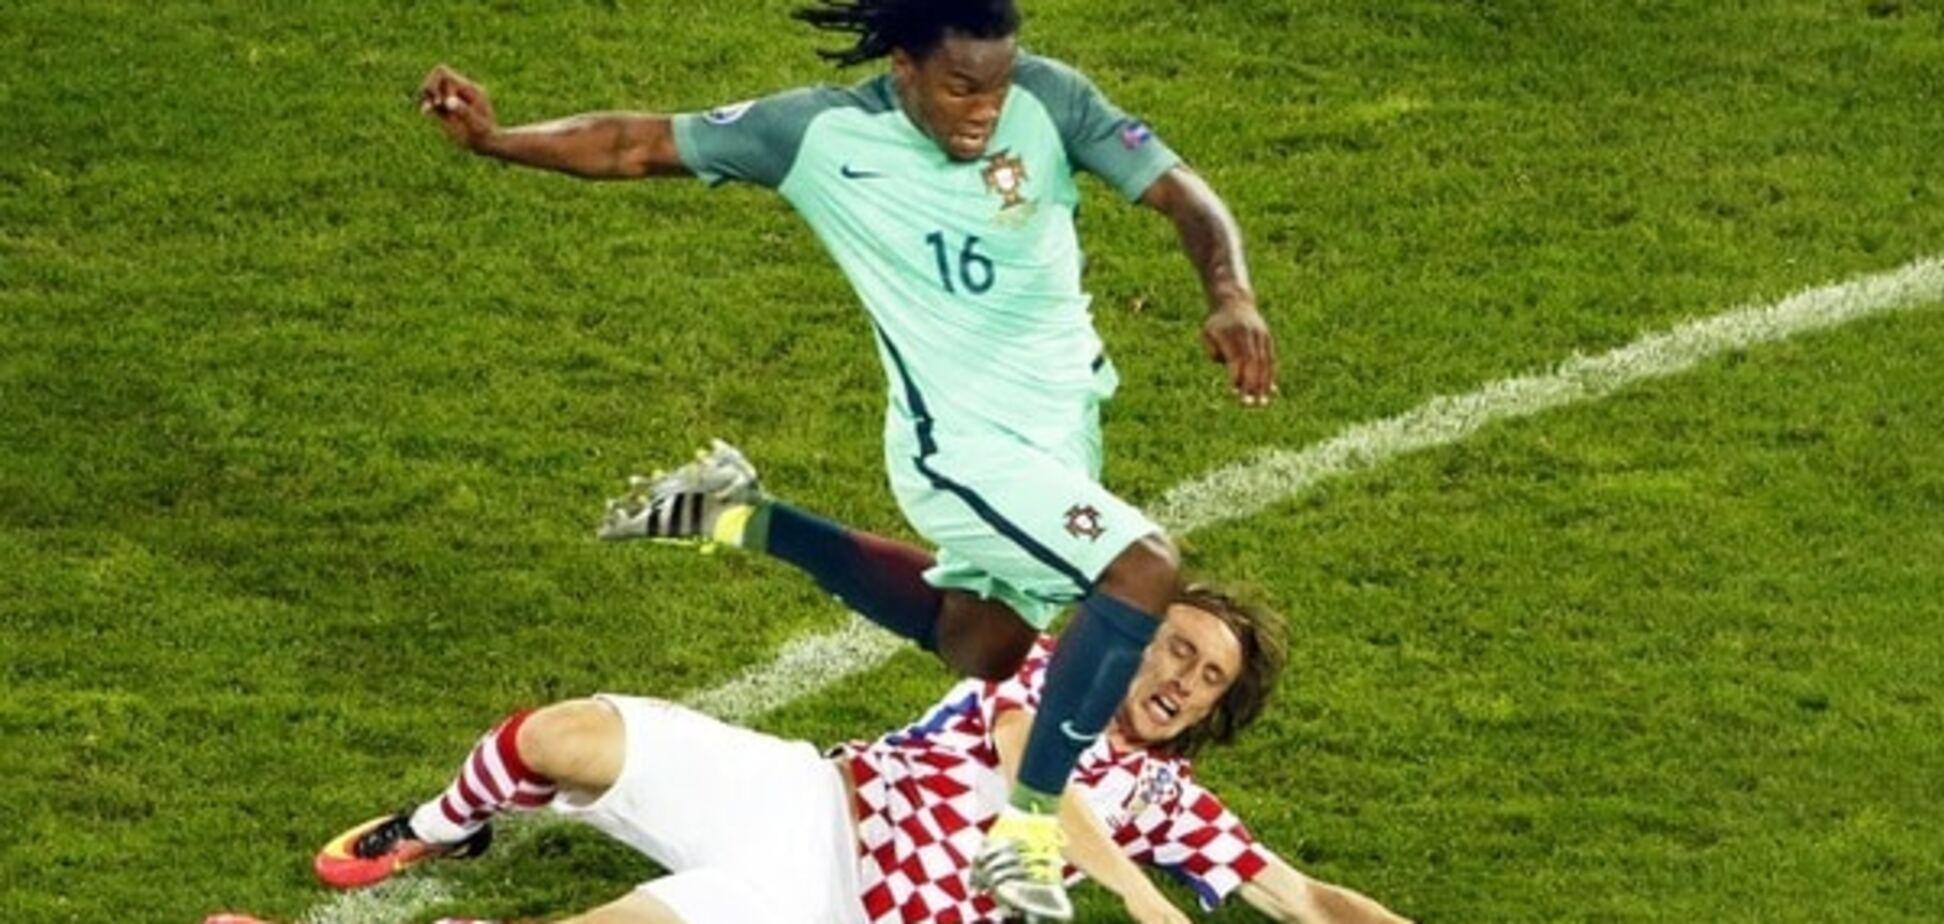 Евро-2016. Хорватия - Португалия: обзор матча